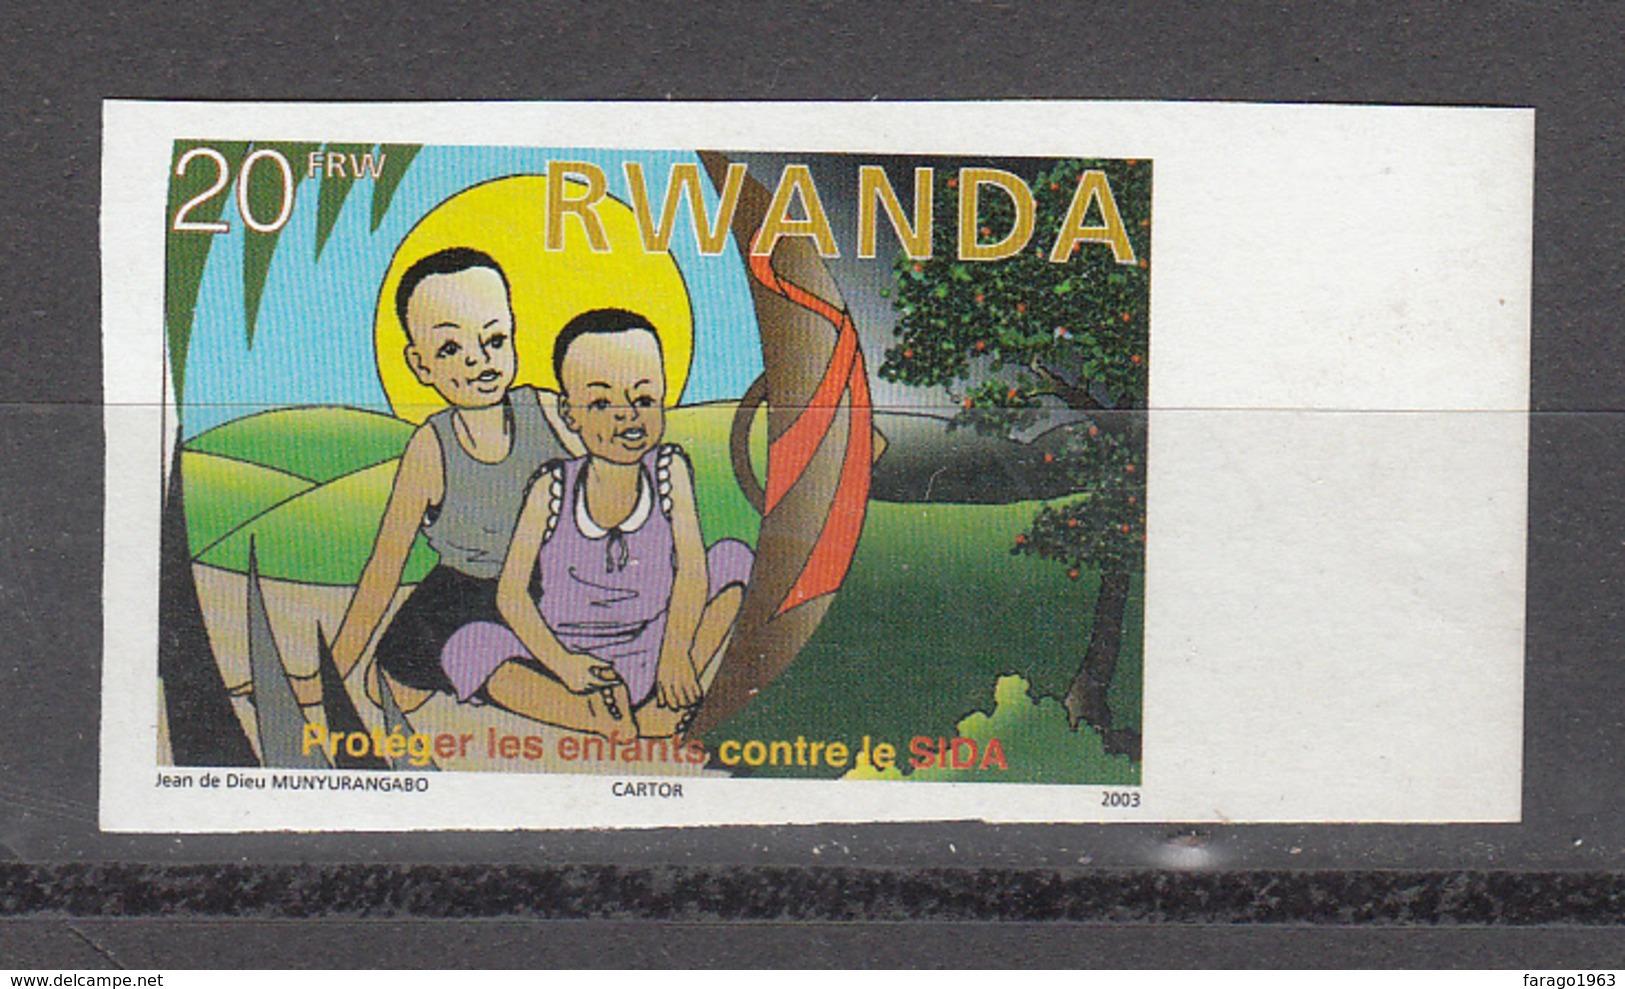 2003 Rwanda Rwandaise Aids Sida Health 20F Value  Imperf Non-Dentele MNH - Rwanda